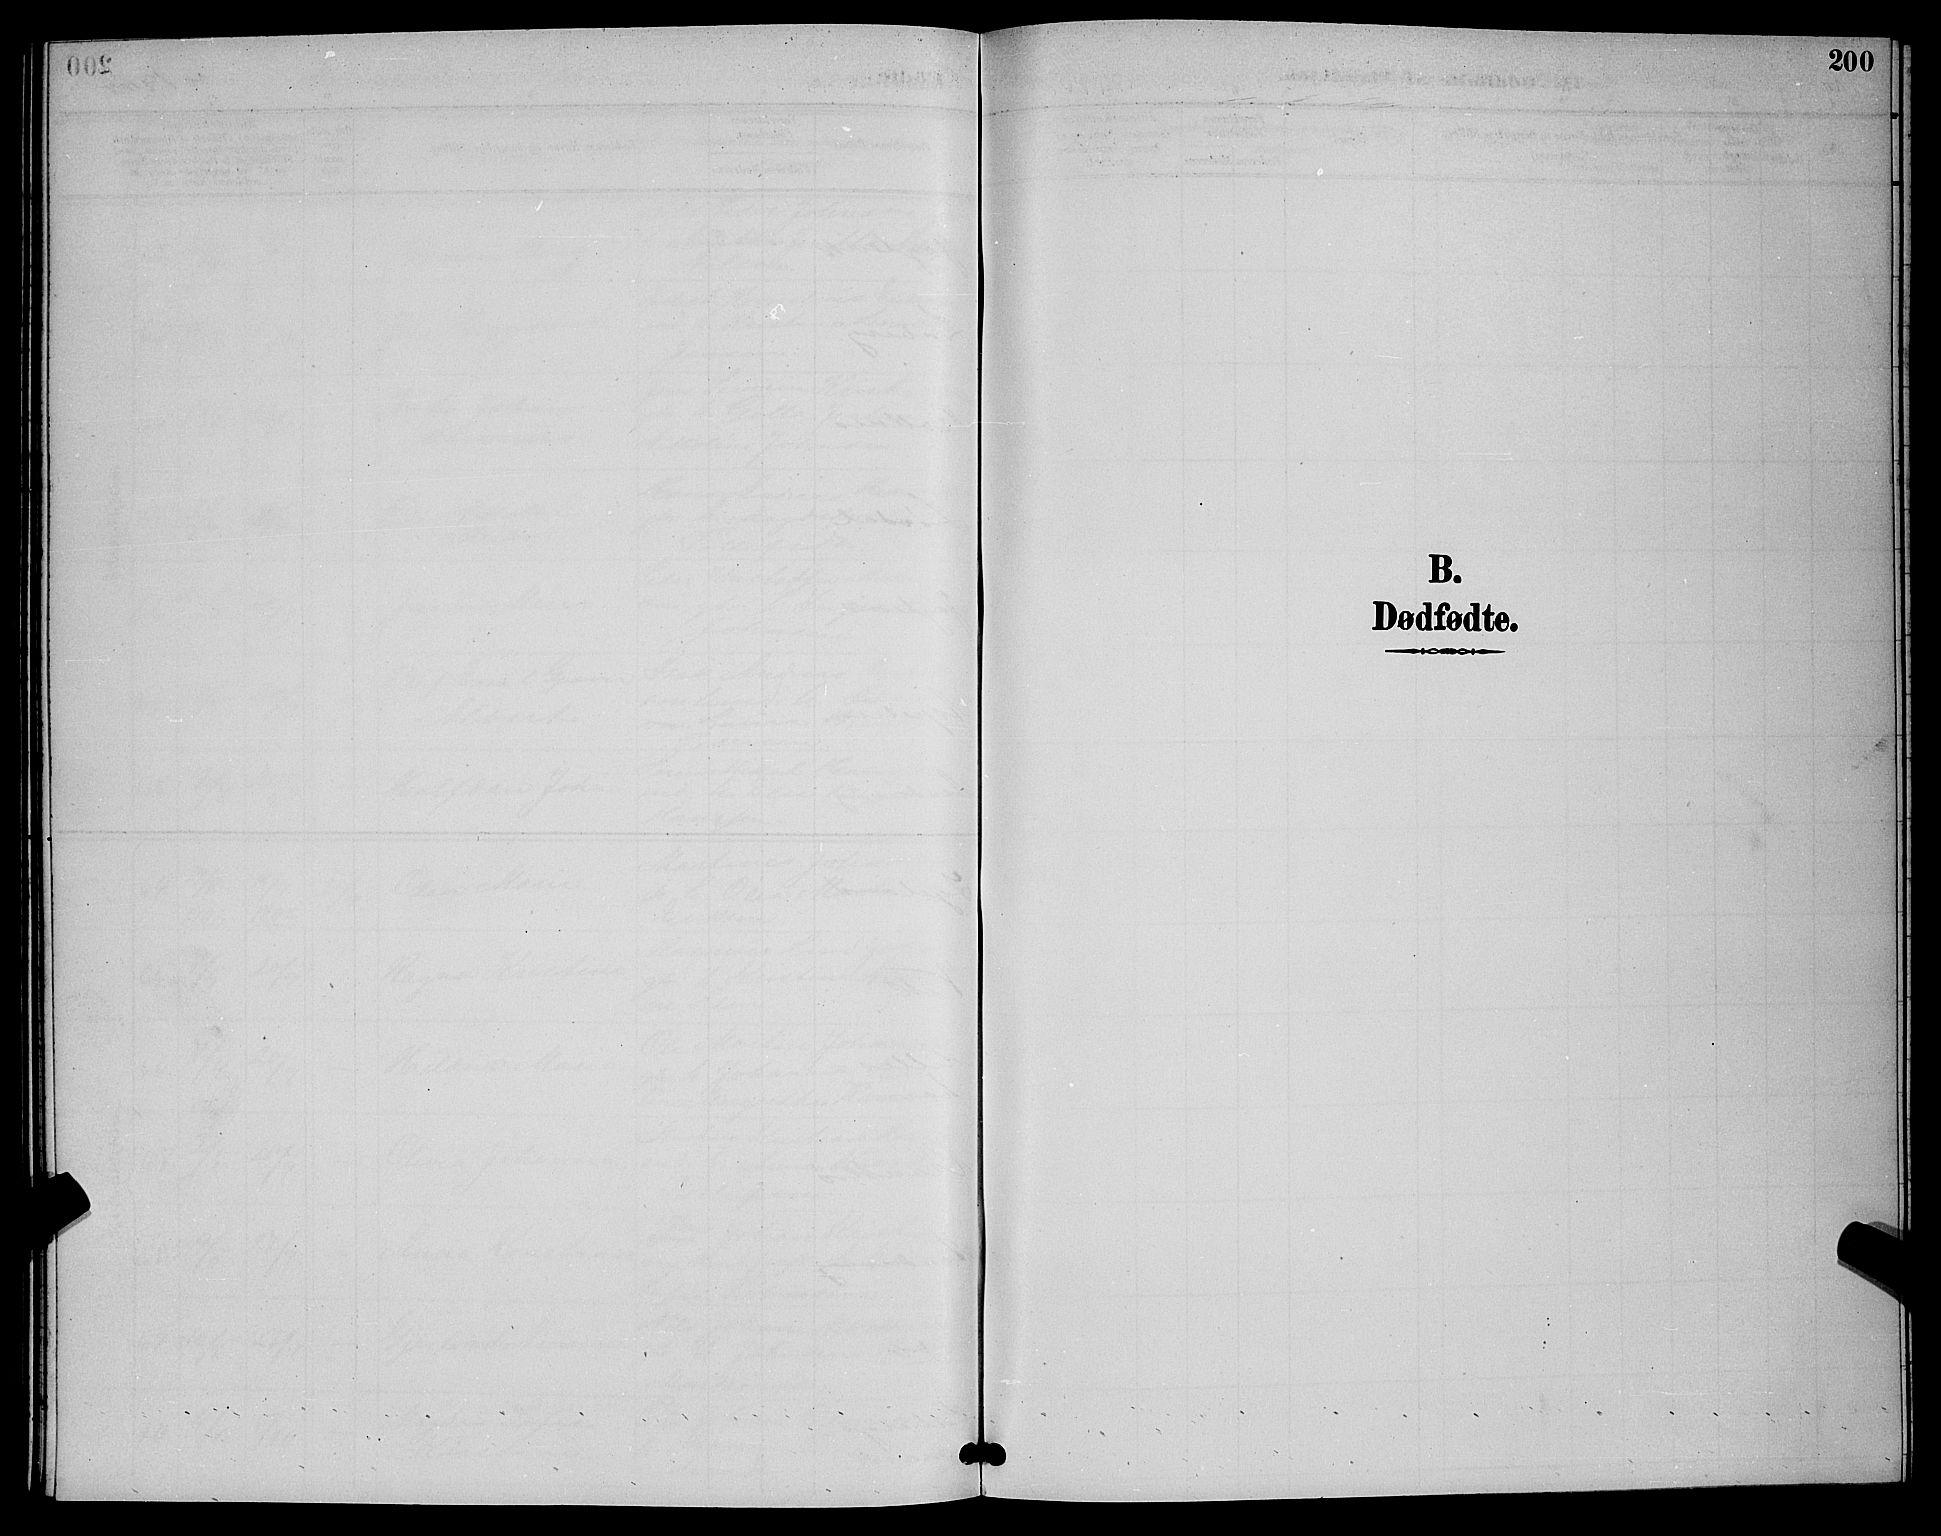 SATØ, Ibestad sokneprestembete, Klokkerbok nr. 8, 1890-1903, s. 200